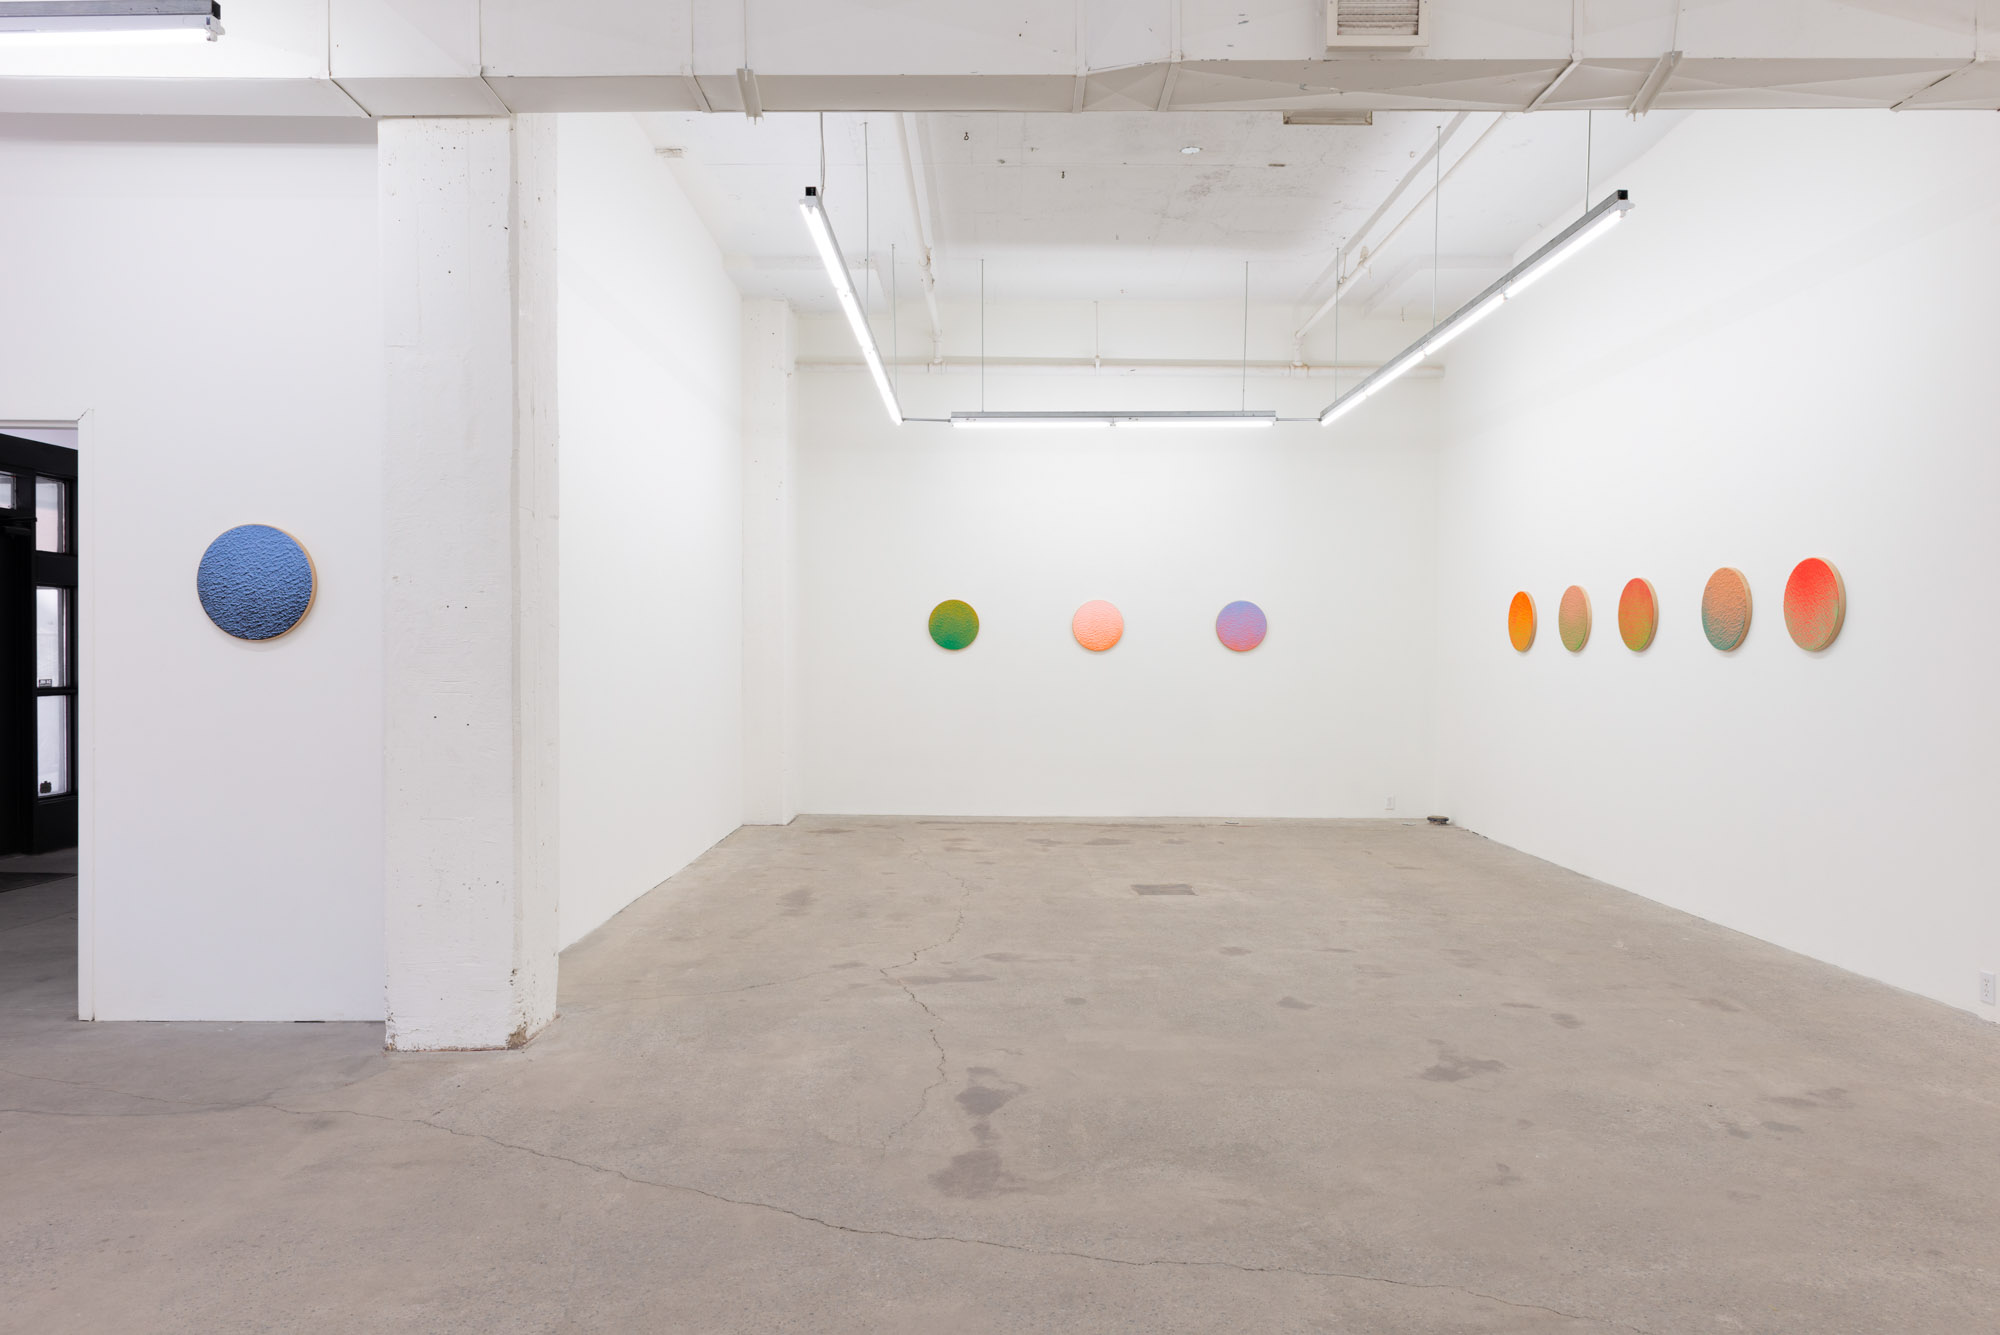 Pierre Julien,  In the Deepest Oceans , 2018, exhibition view, Galerie Nicolas Robert, photo : Jean-Michael Seminaro